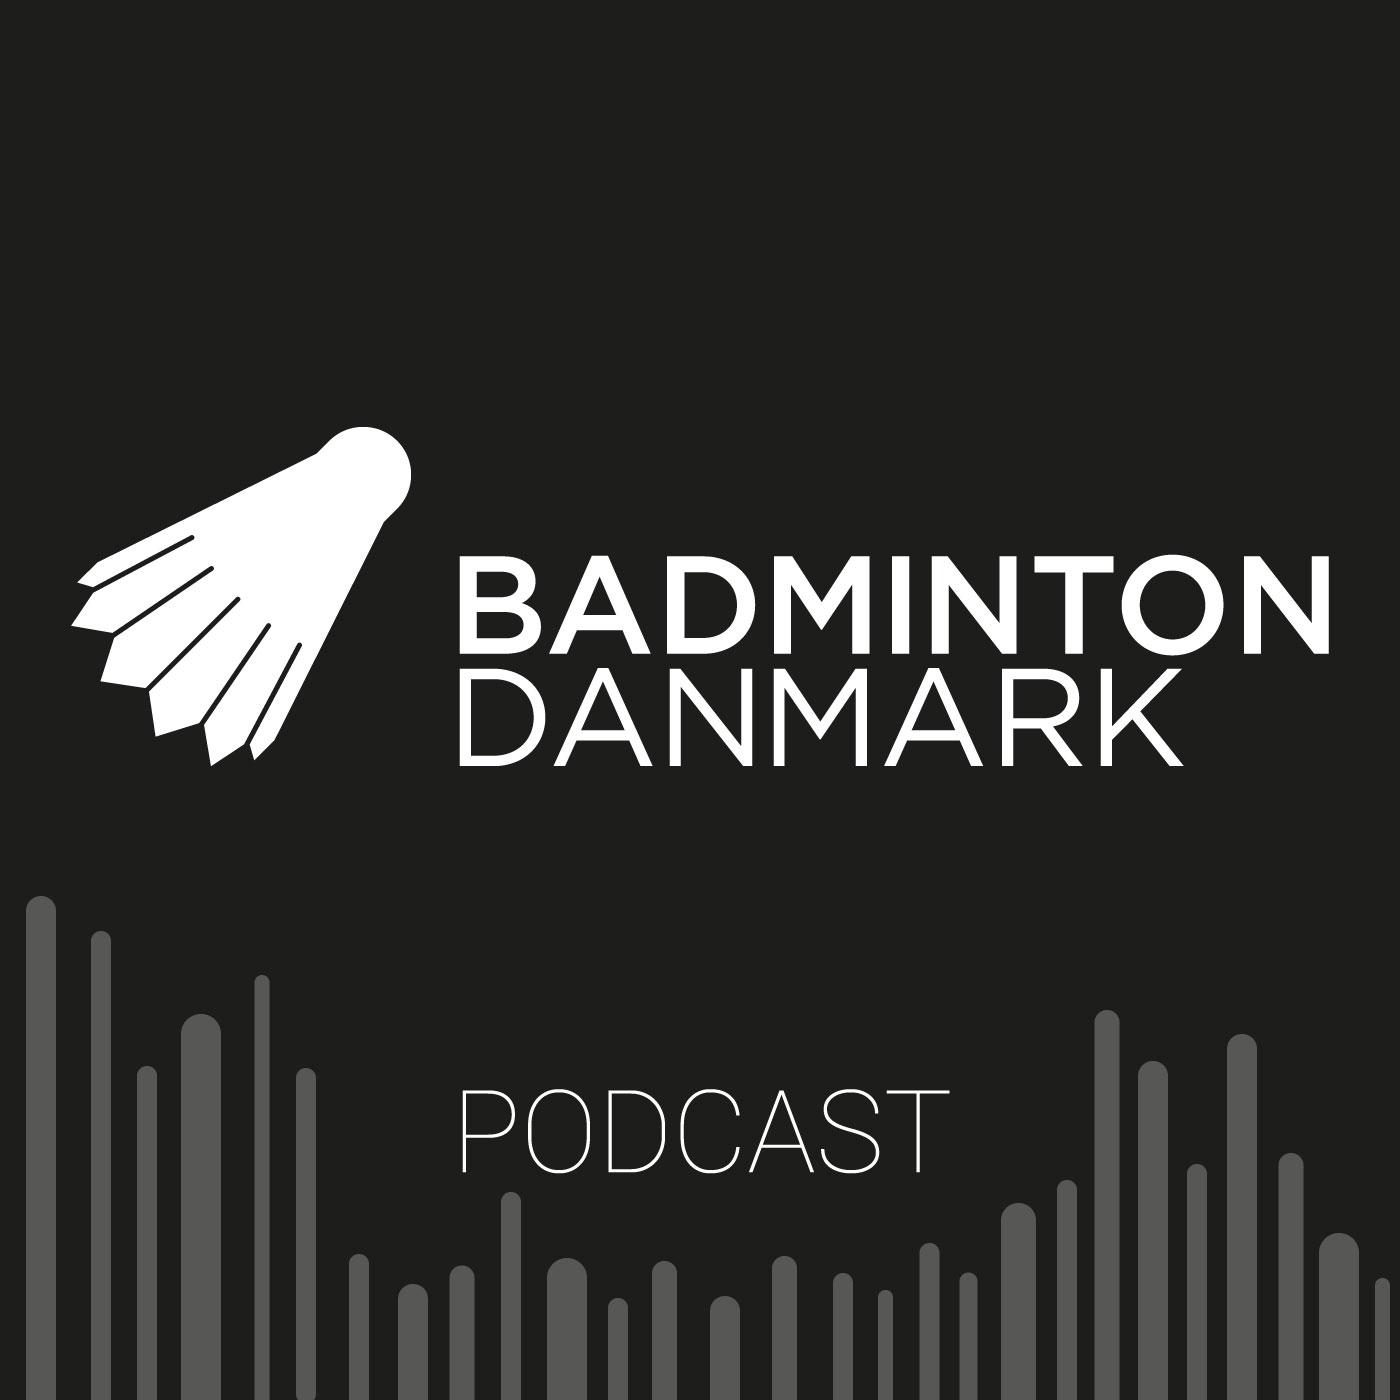 Badminton Danmark Podcast show art